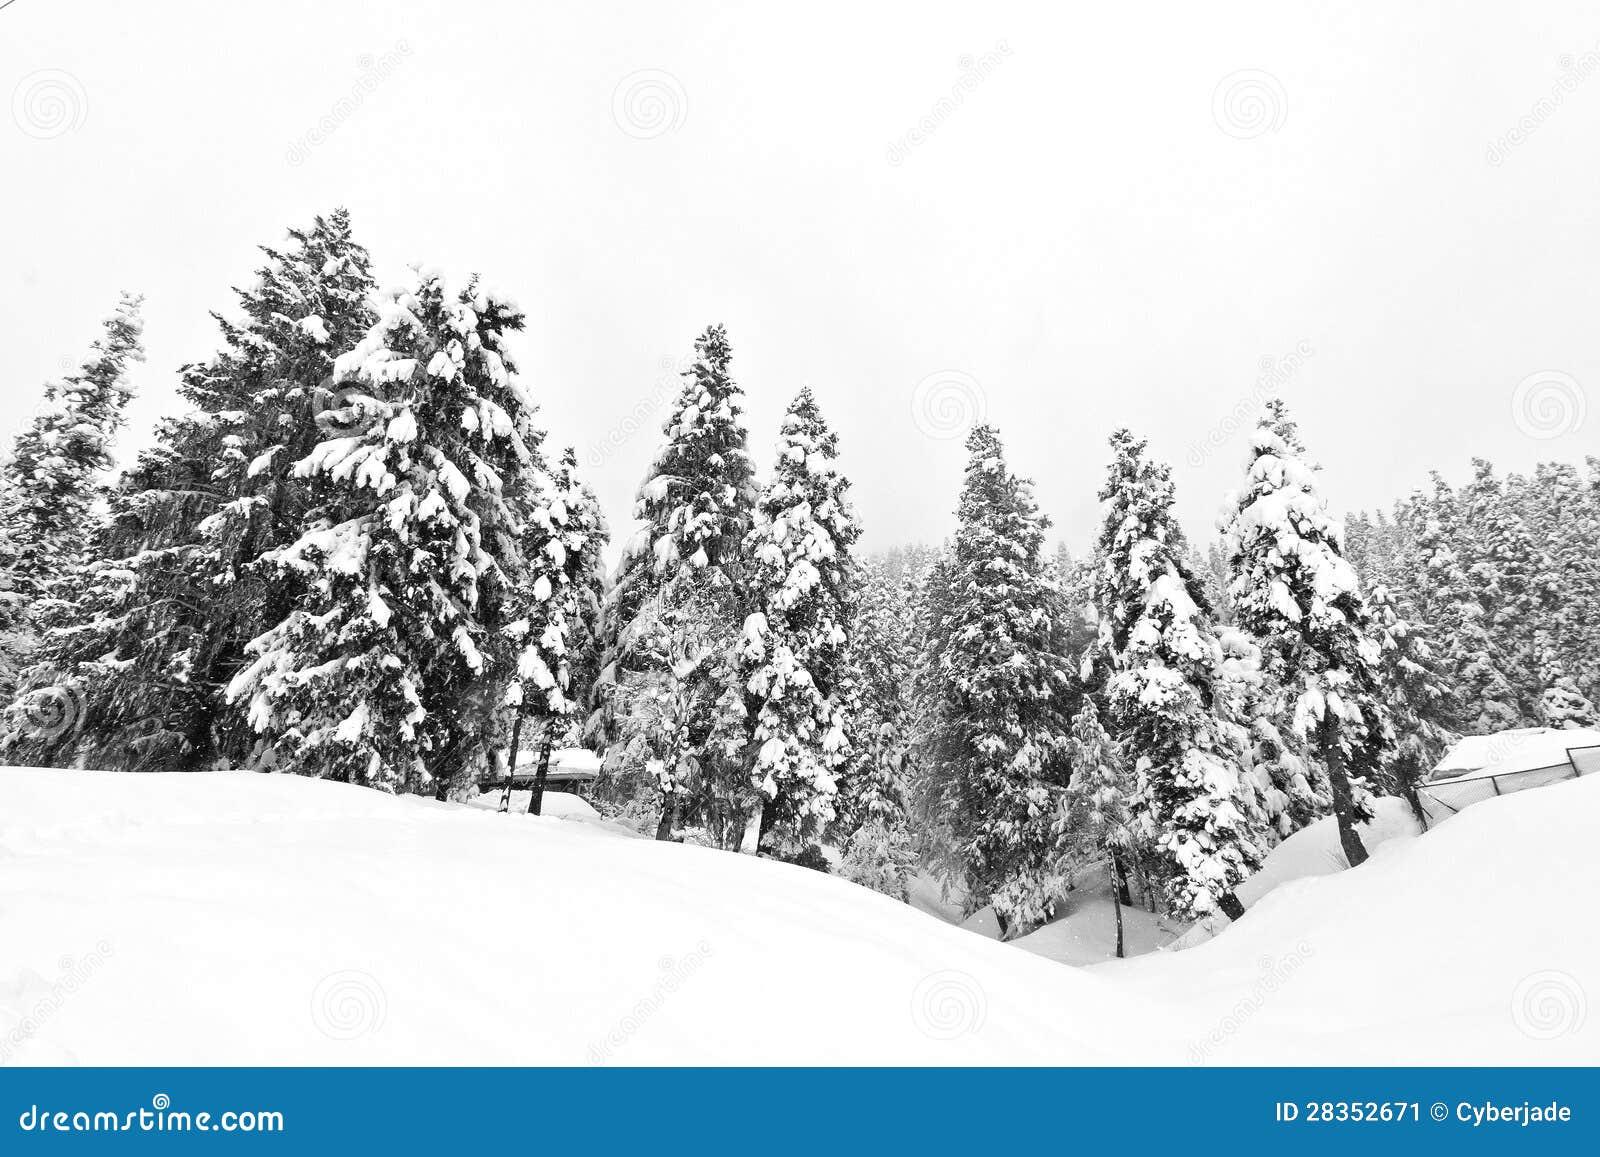 Black And White Misty : Dark forest in winter landscape black white stock